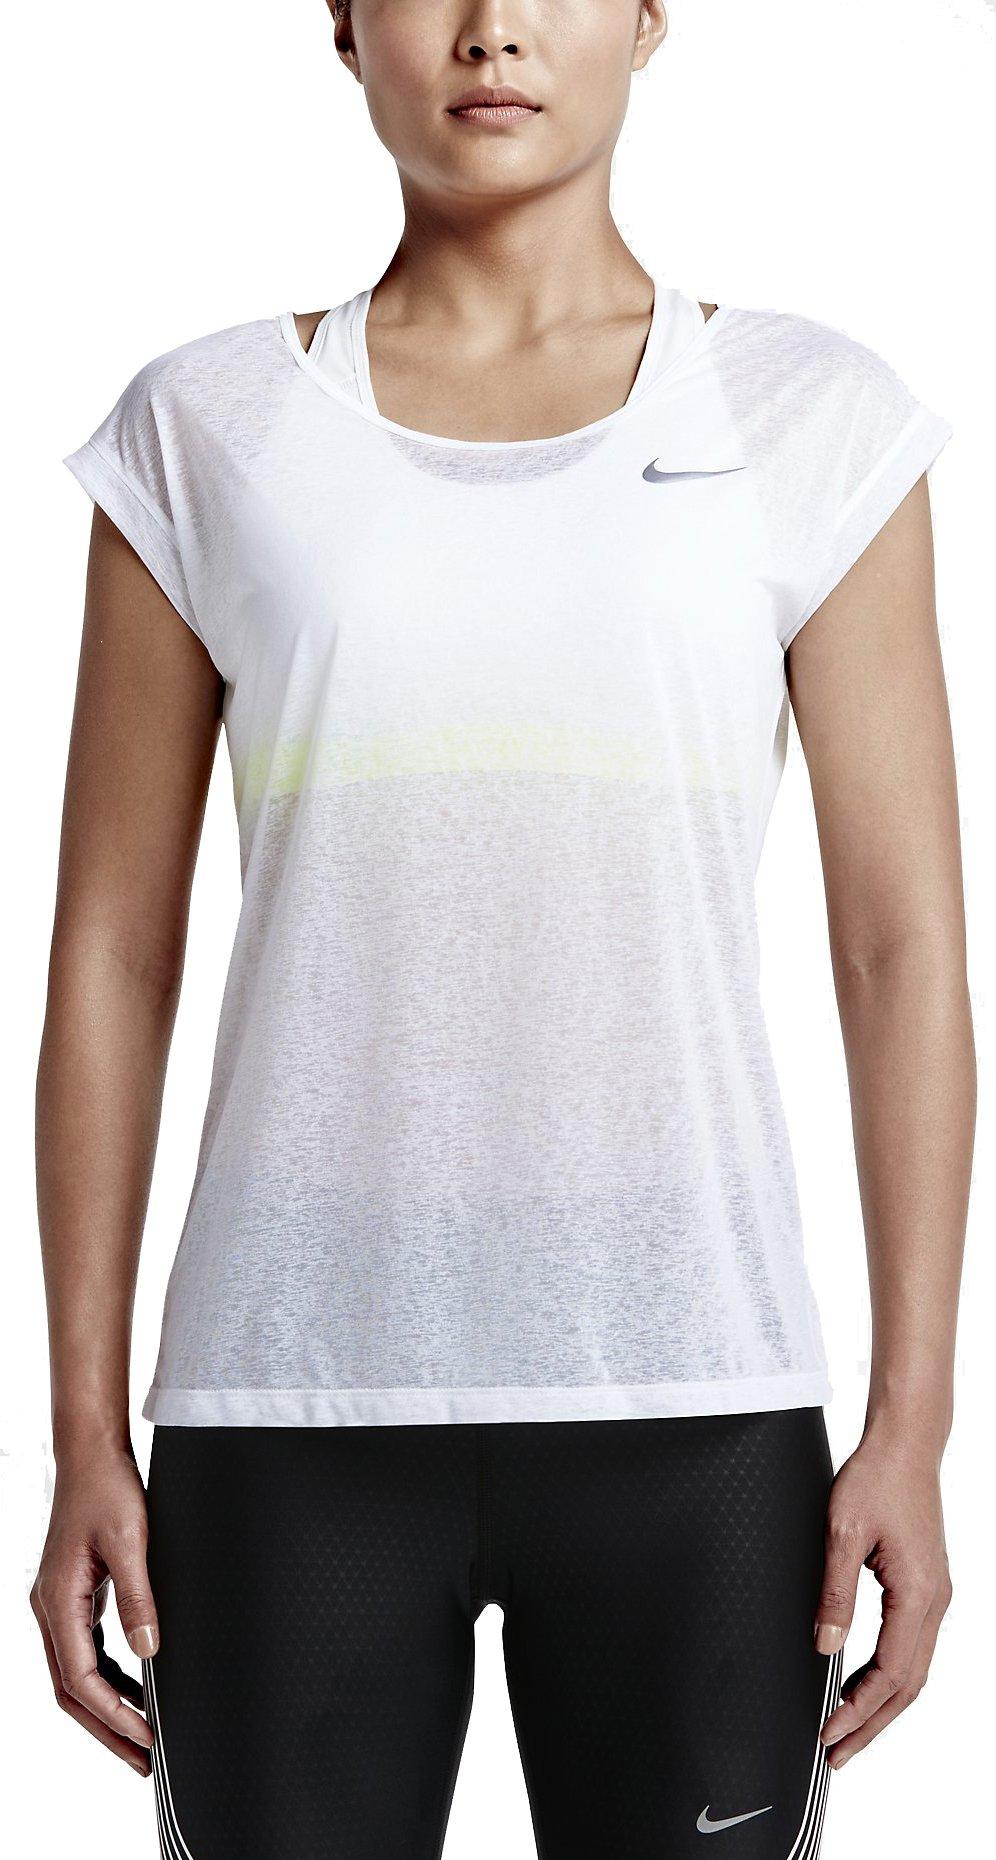 Triko s krátkým rukávem Nike Dri-FIT Cool